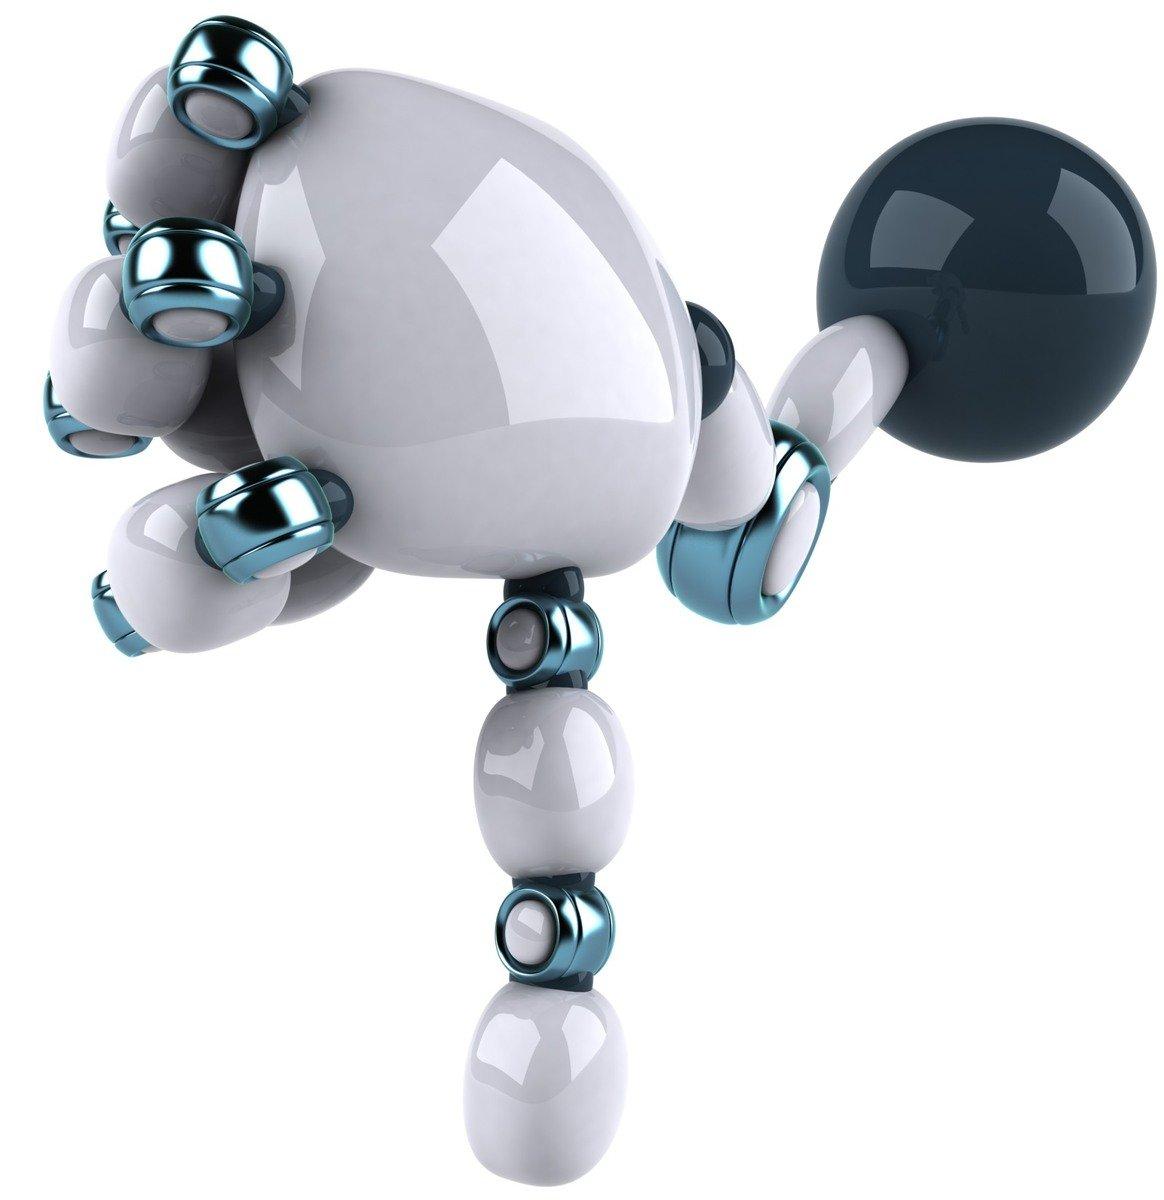 Free Robotic hand Stock Photo - FreeImages com